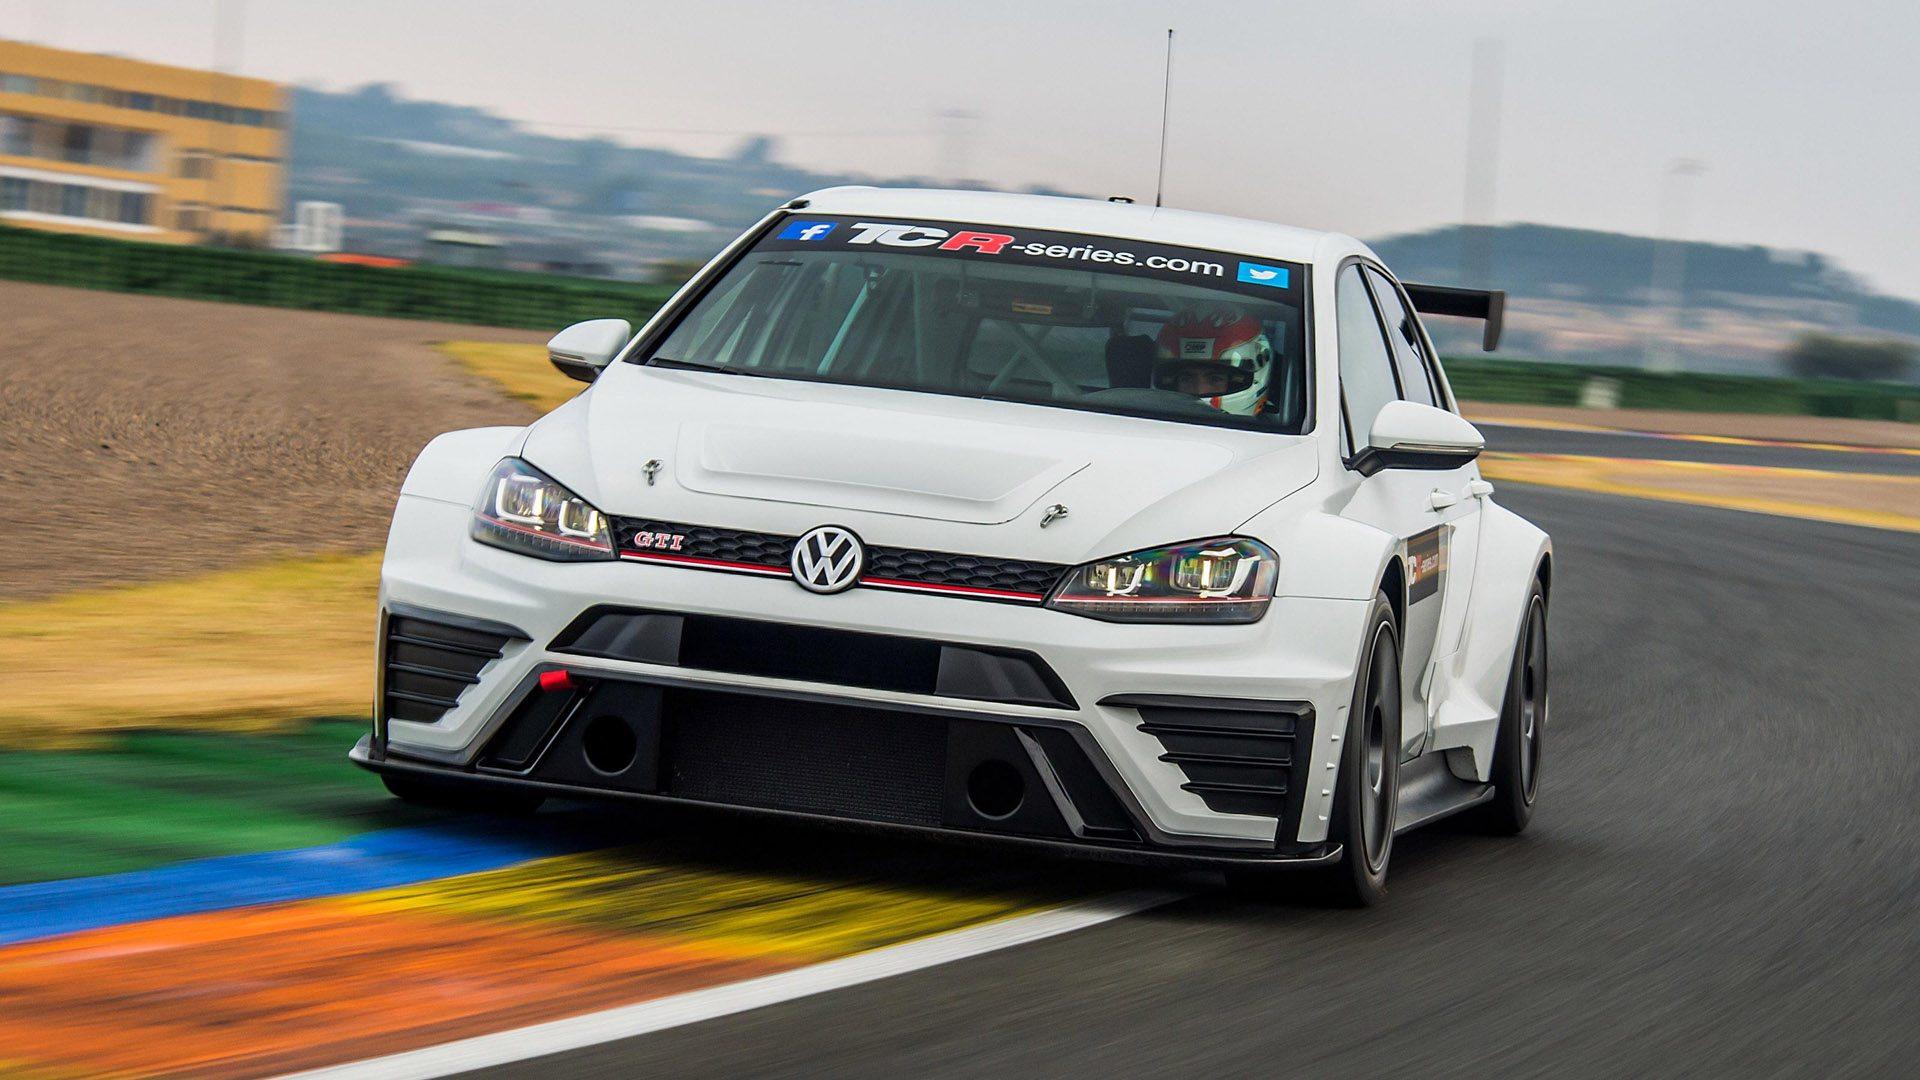 Volkswagen Golf Gti Tcr 2016